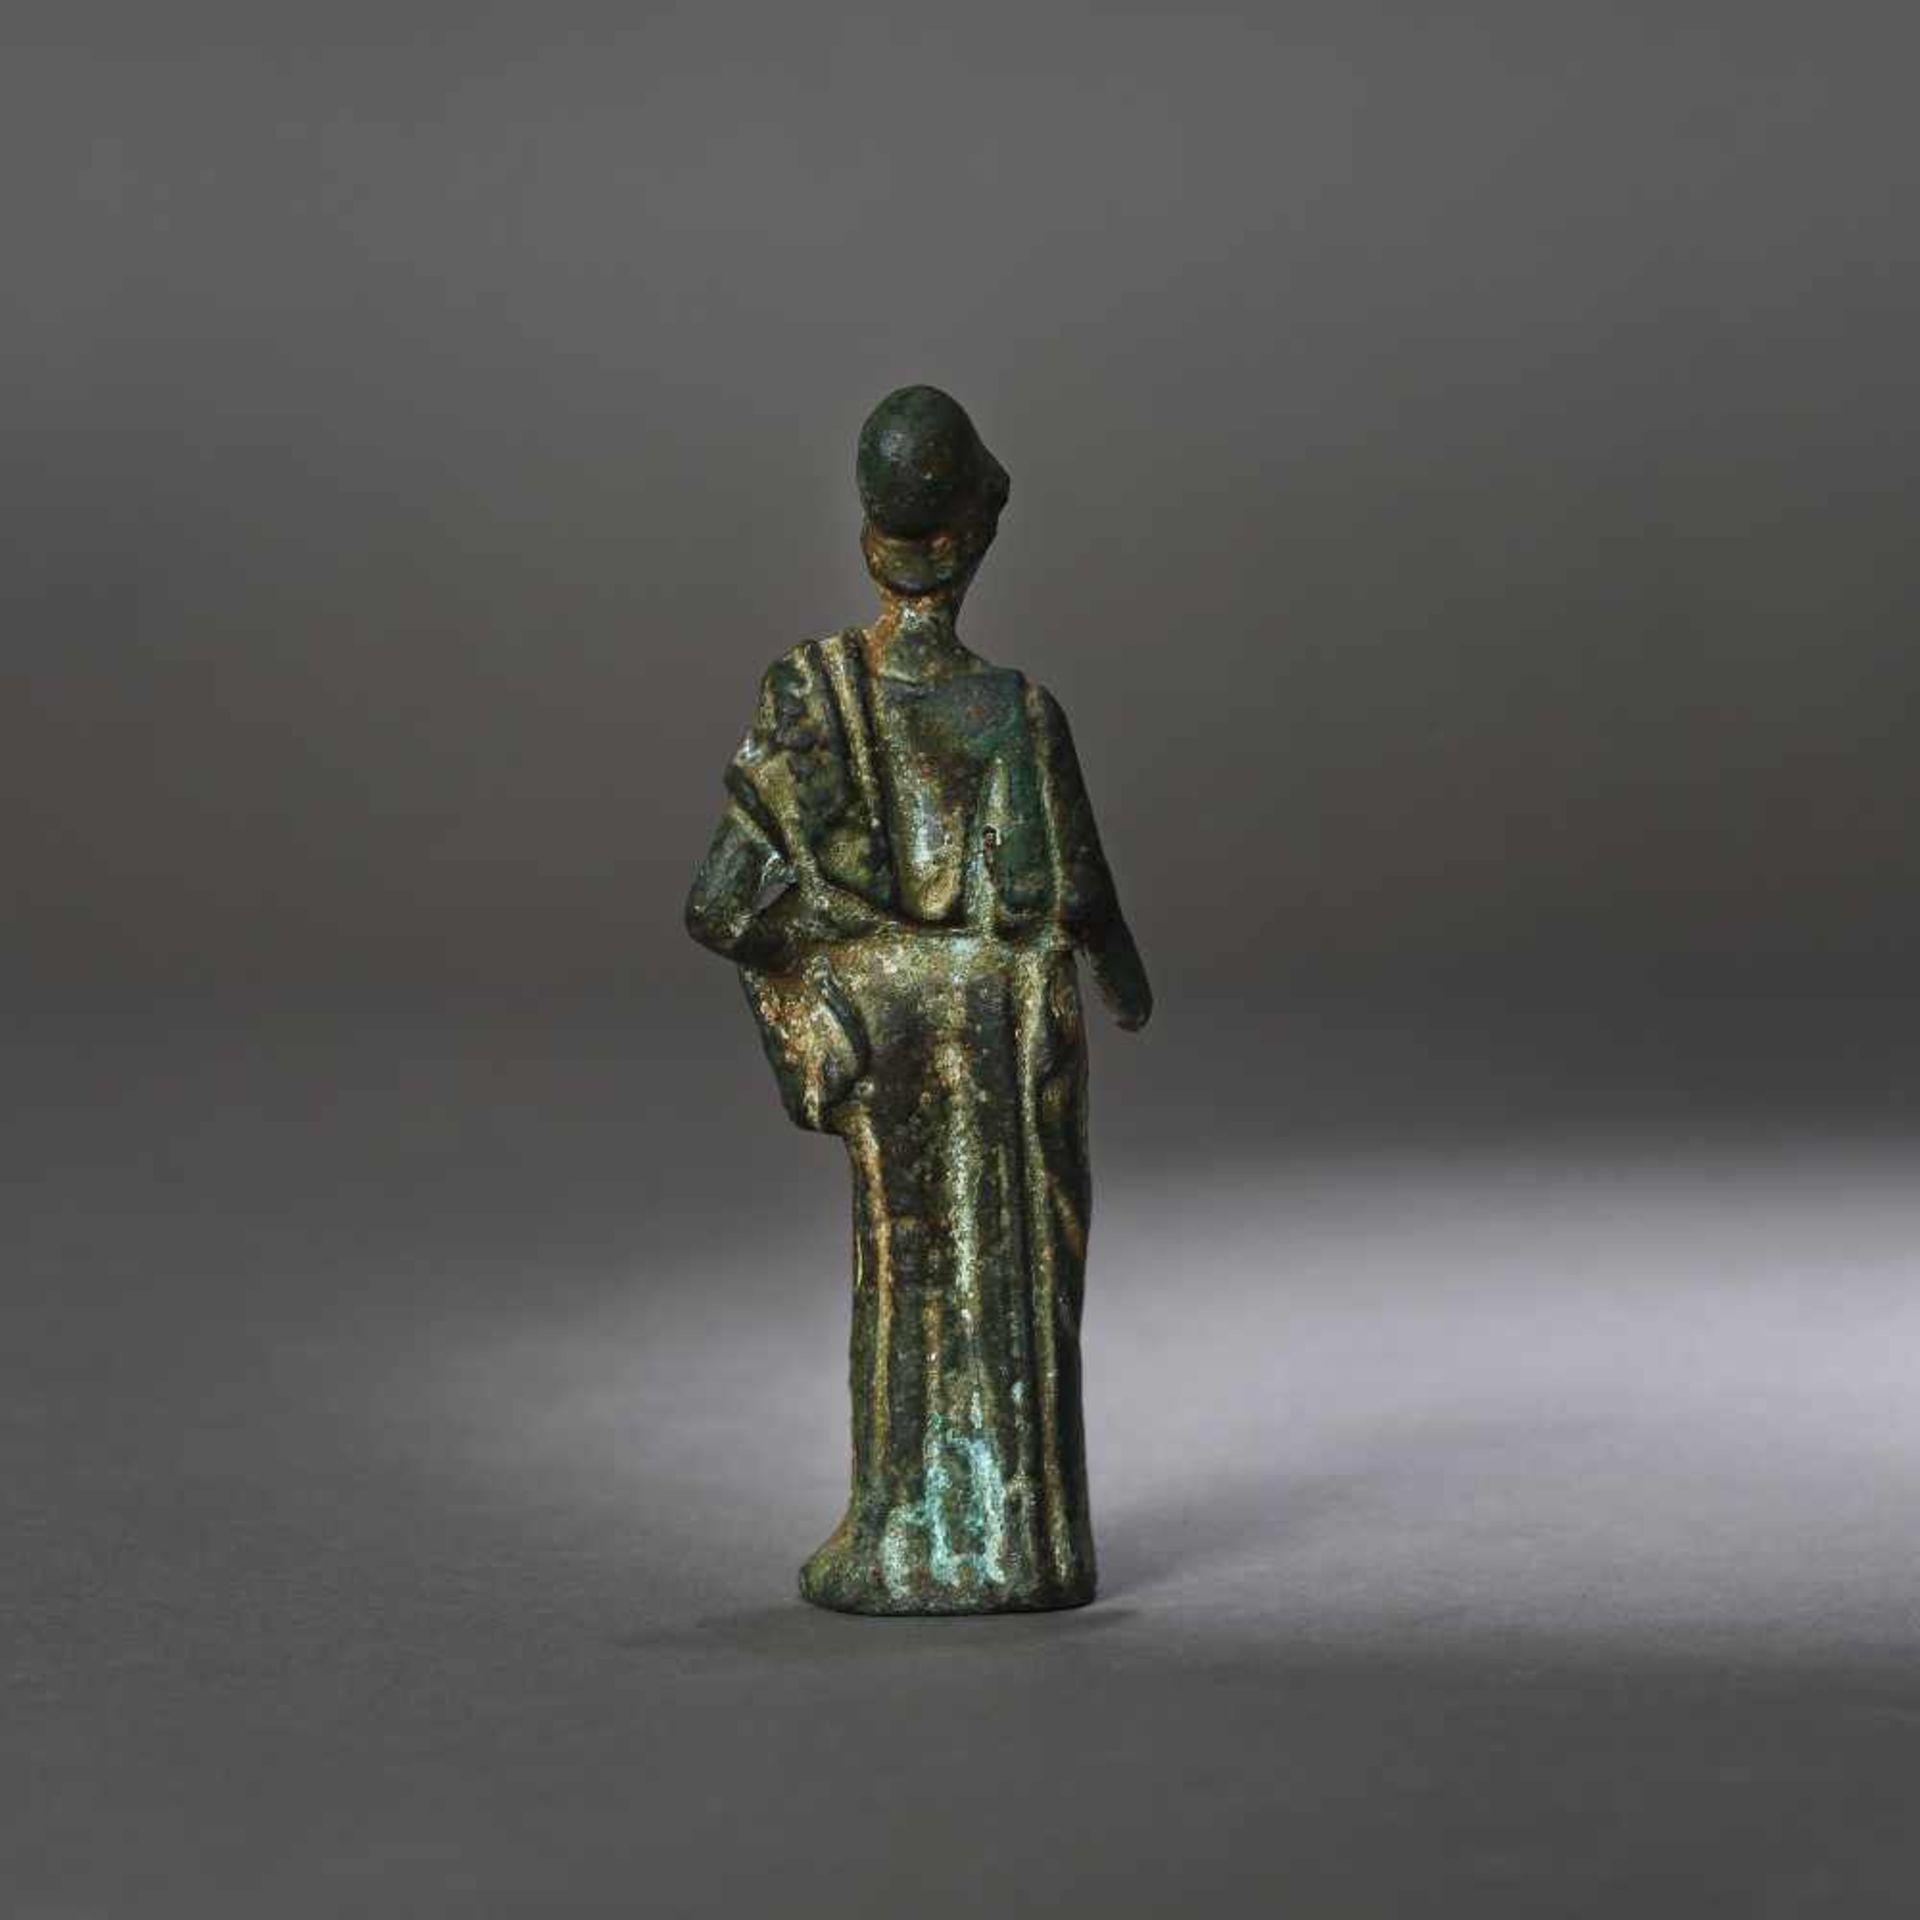 Bronze statuette depicting Athena, the goddess of wisdom, 1st century B.C. - Bild 4 aus 4